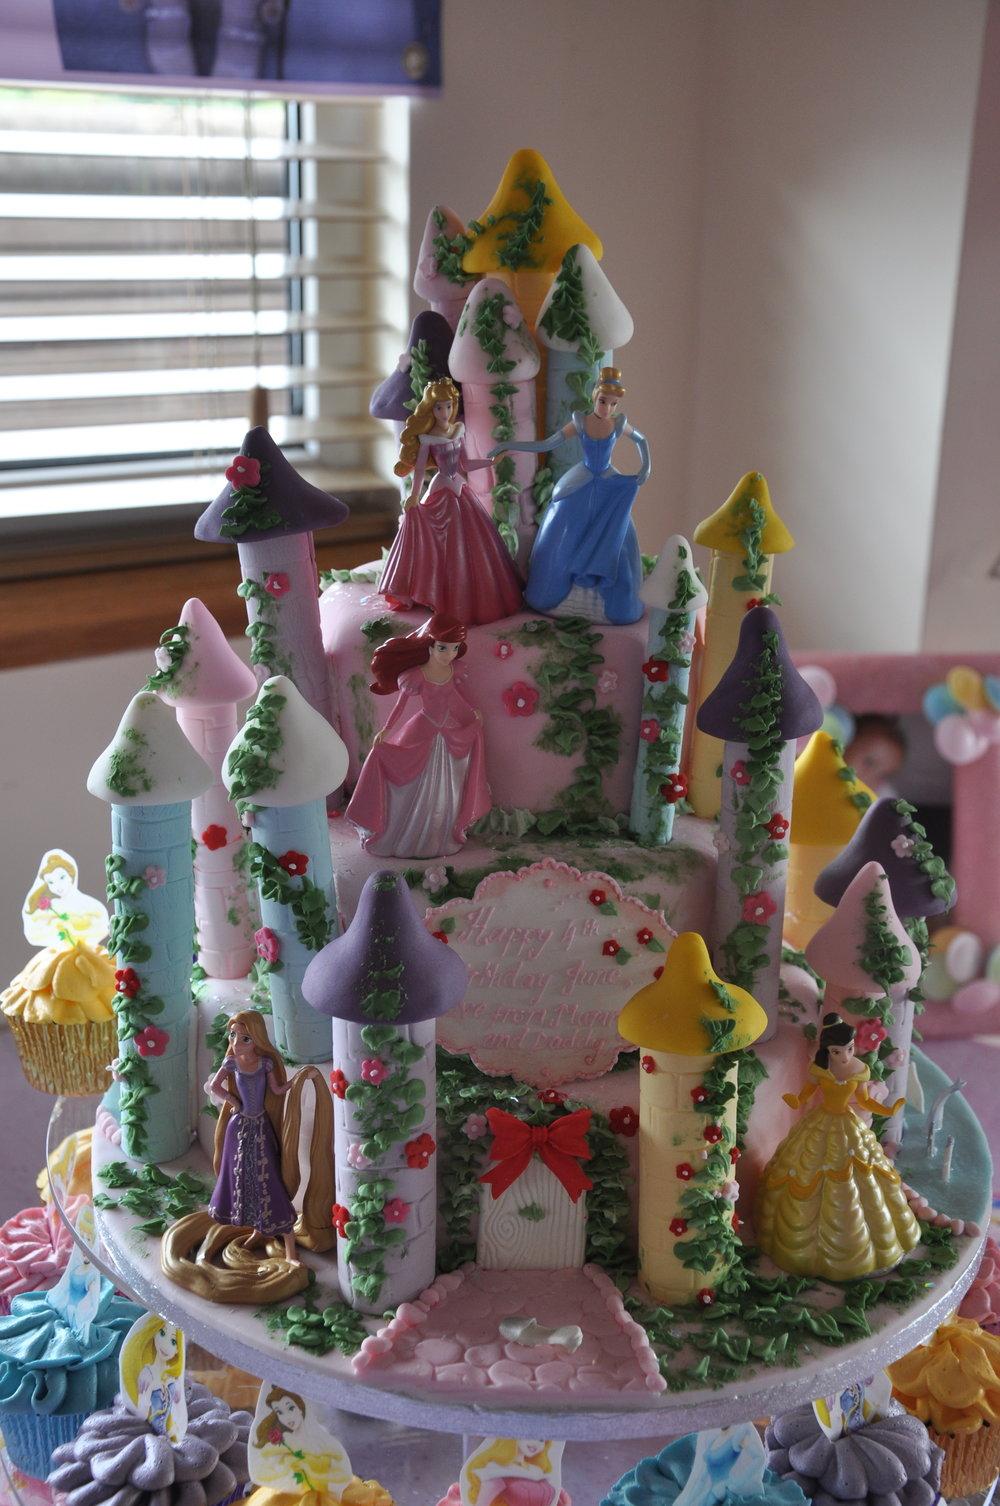 2014-06-29 Disney Princess Castle Cake and Cupcakes 19.JPG